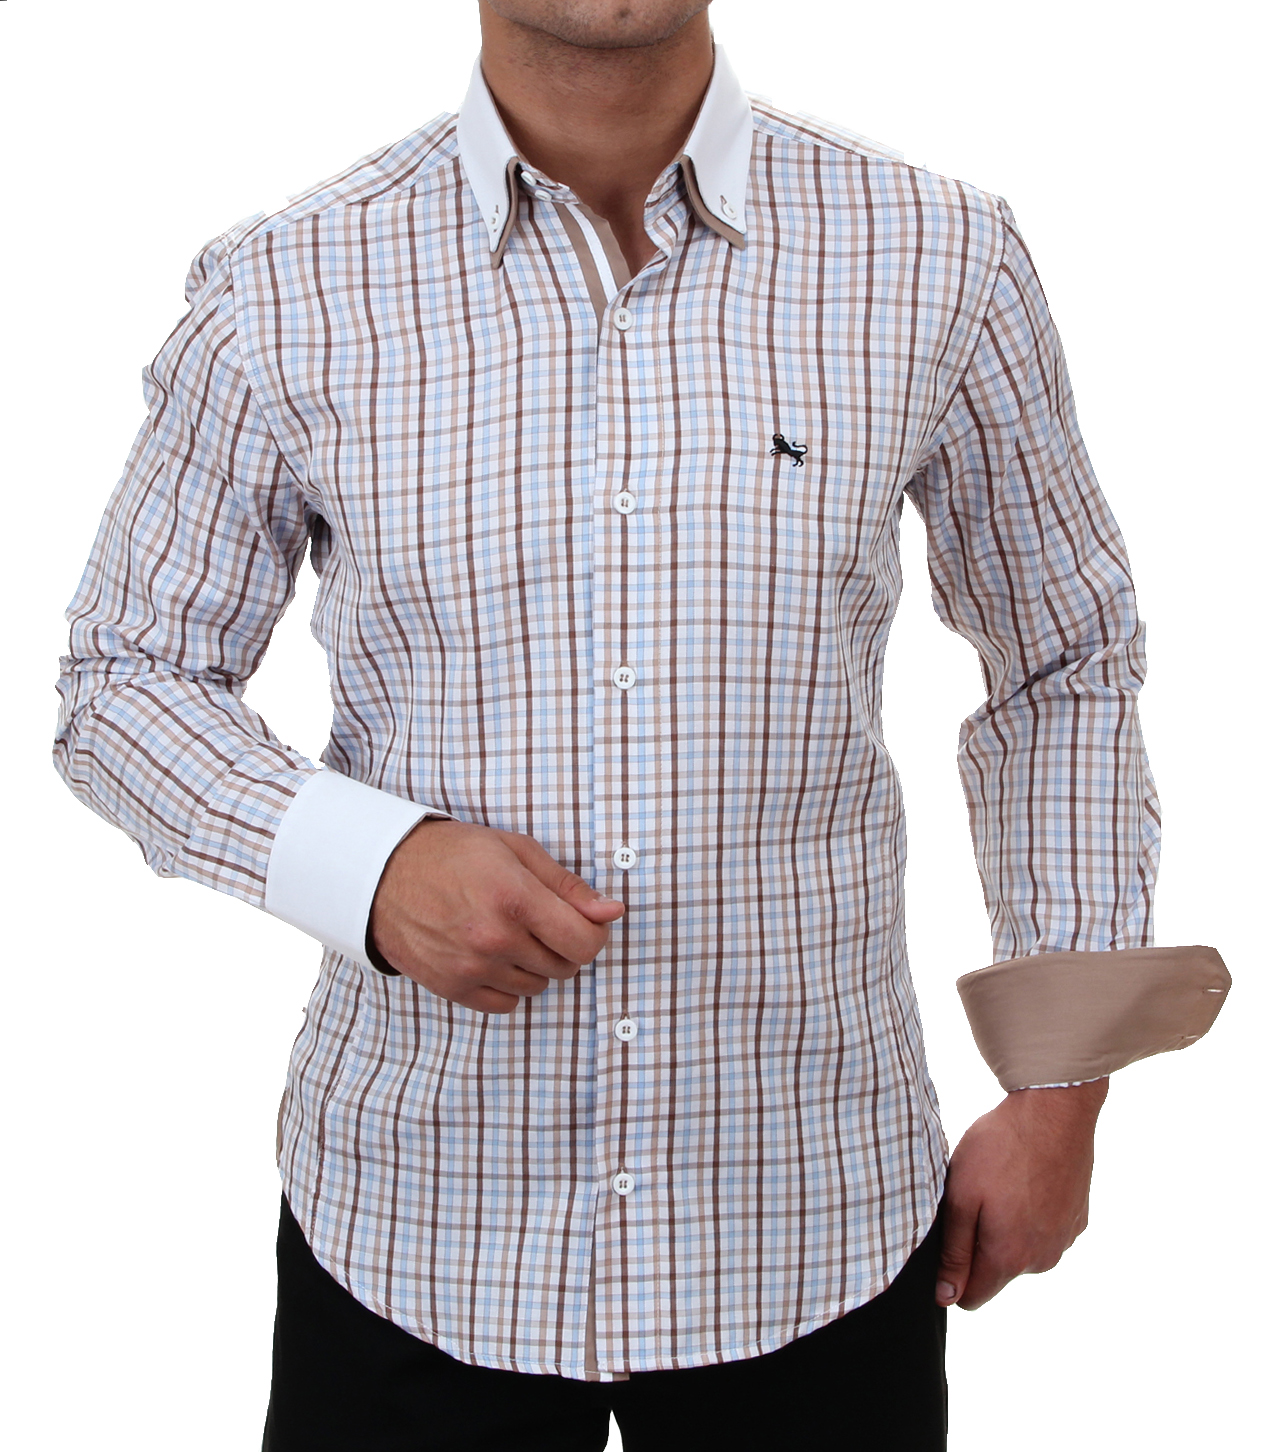 newest 9492f 5c160 H.K. Mandel Kreative Mode für Männer - Casual Herren Hemd ...